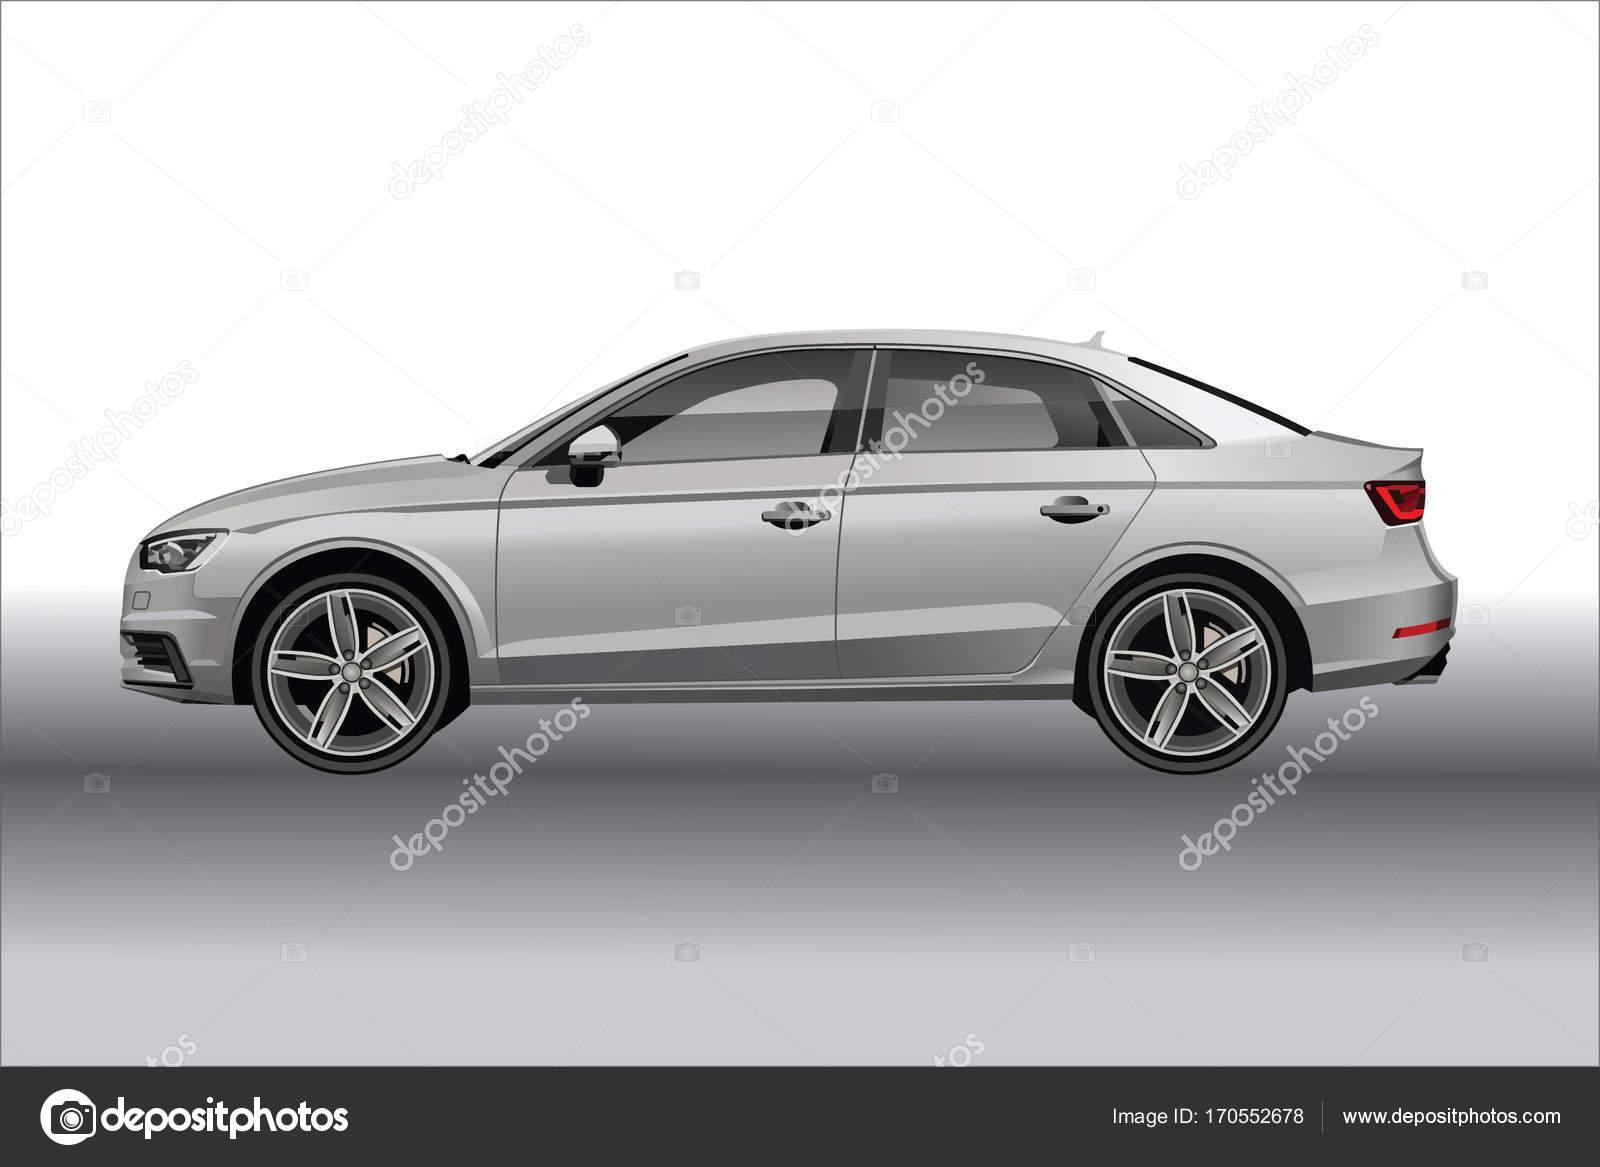 Audi A Side View Stock Vector AlexKlik - Audi car vector